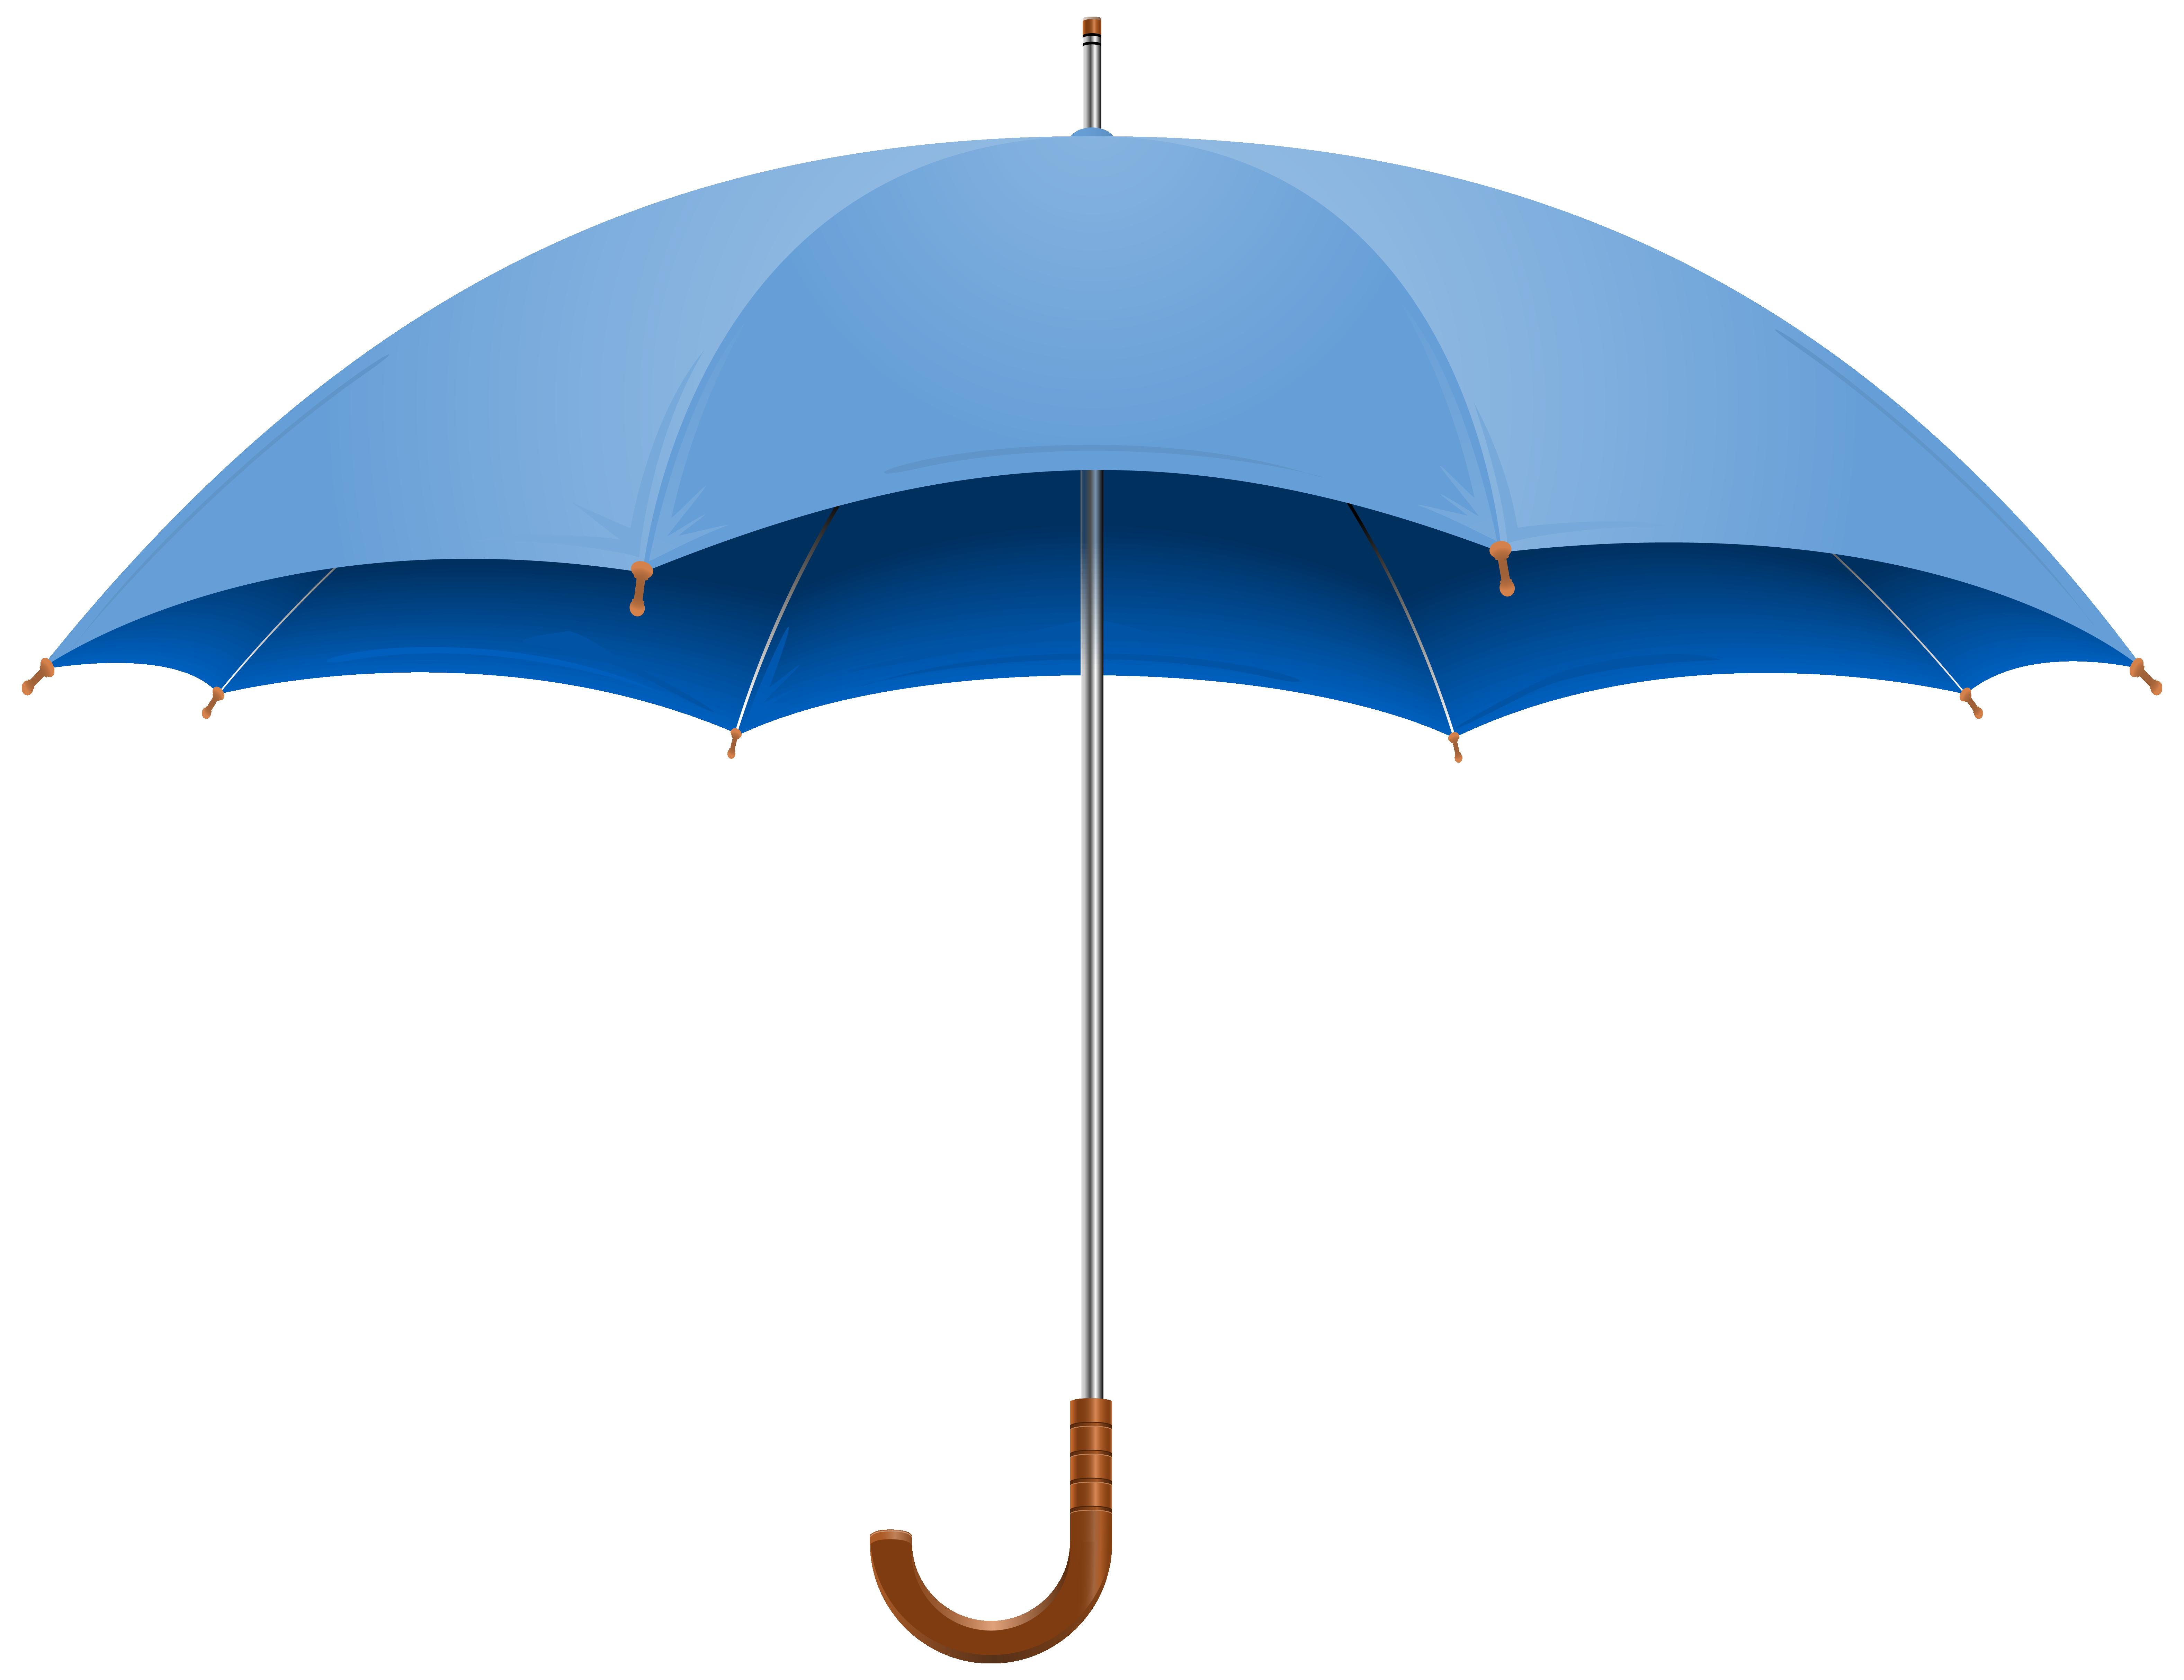 6308x4853 Blue Open Umbrella Png Clipart Imageu200b Gallery Yopriceville